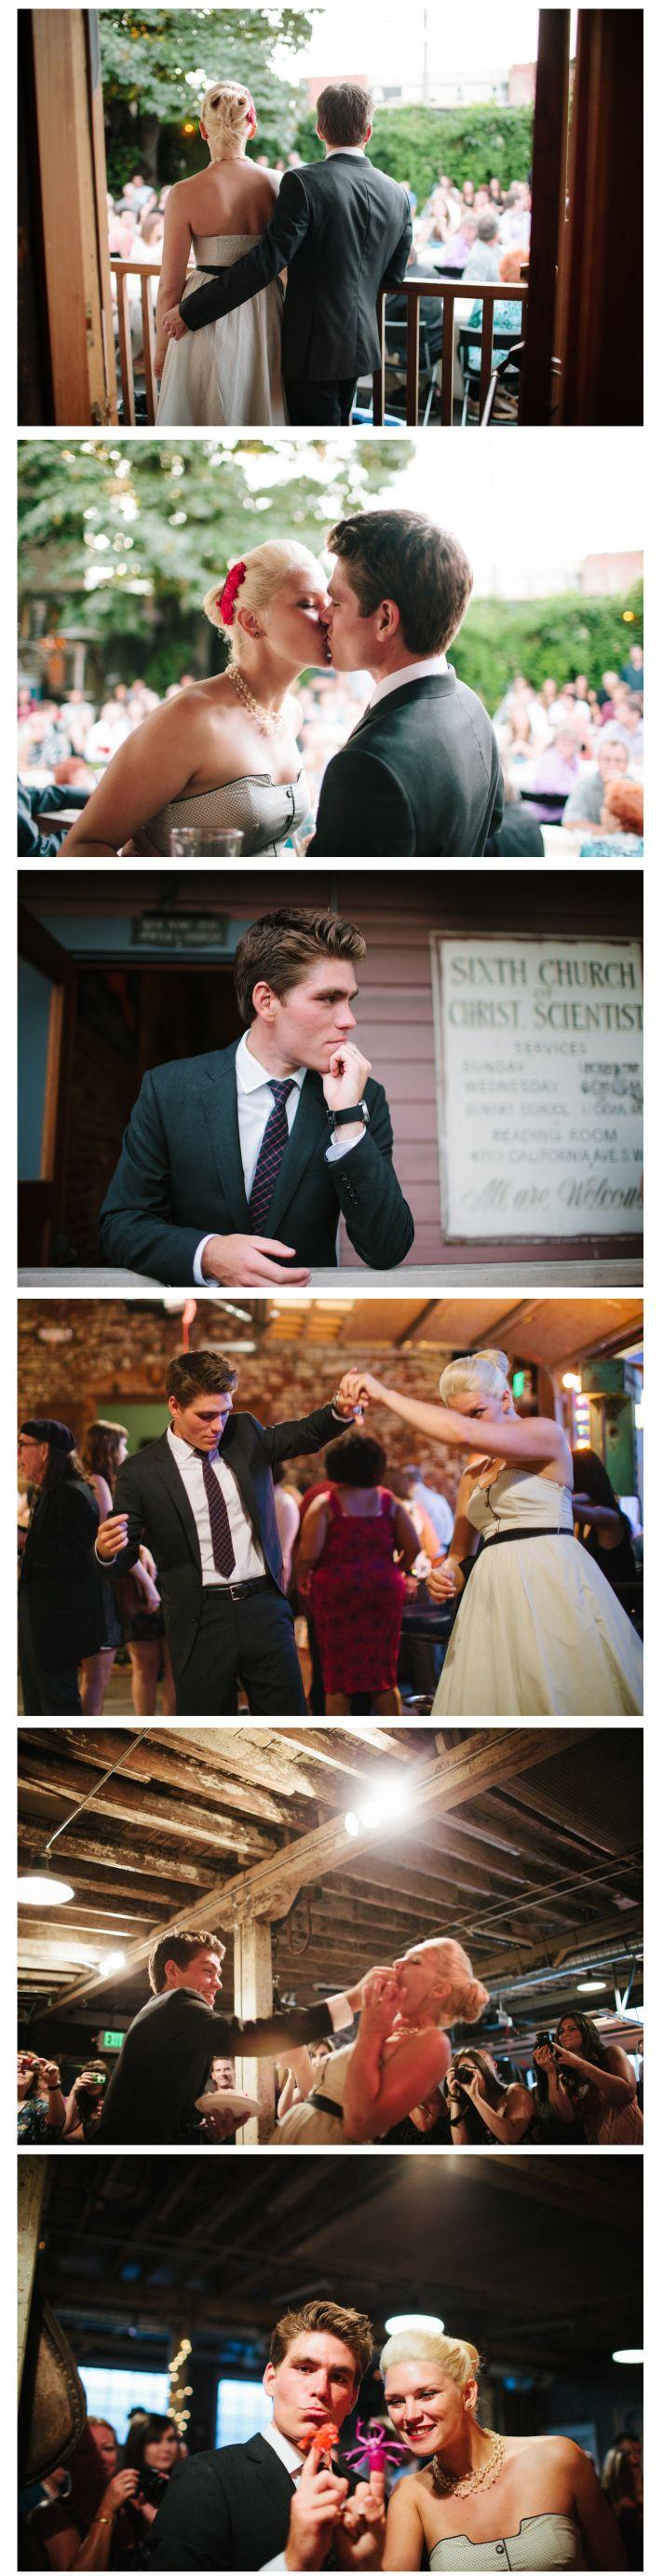 coffey wood beach real wedding linhbergh photography bride groom details couple reception